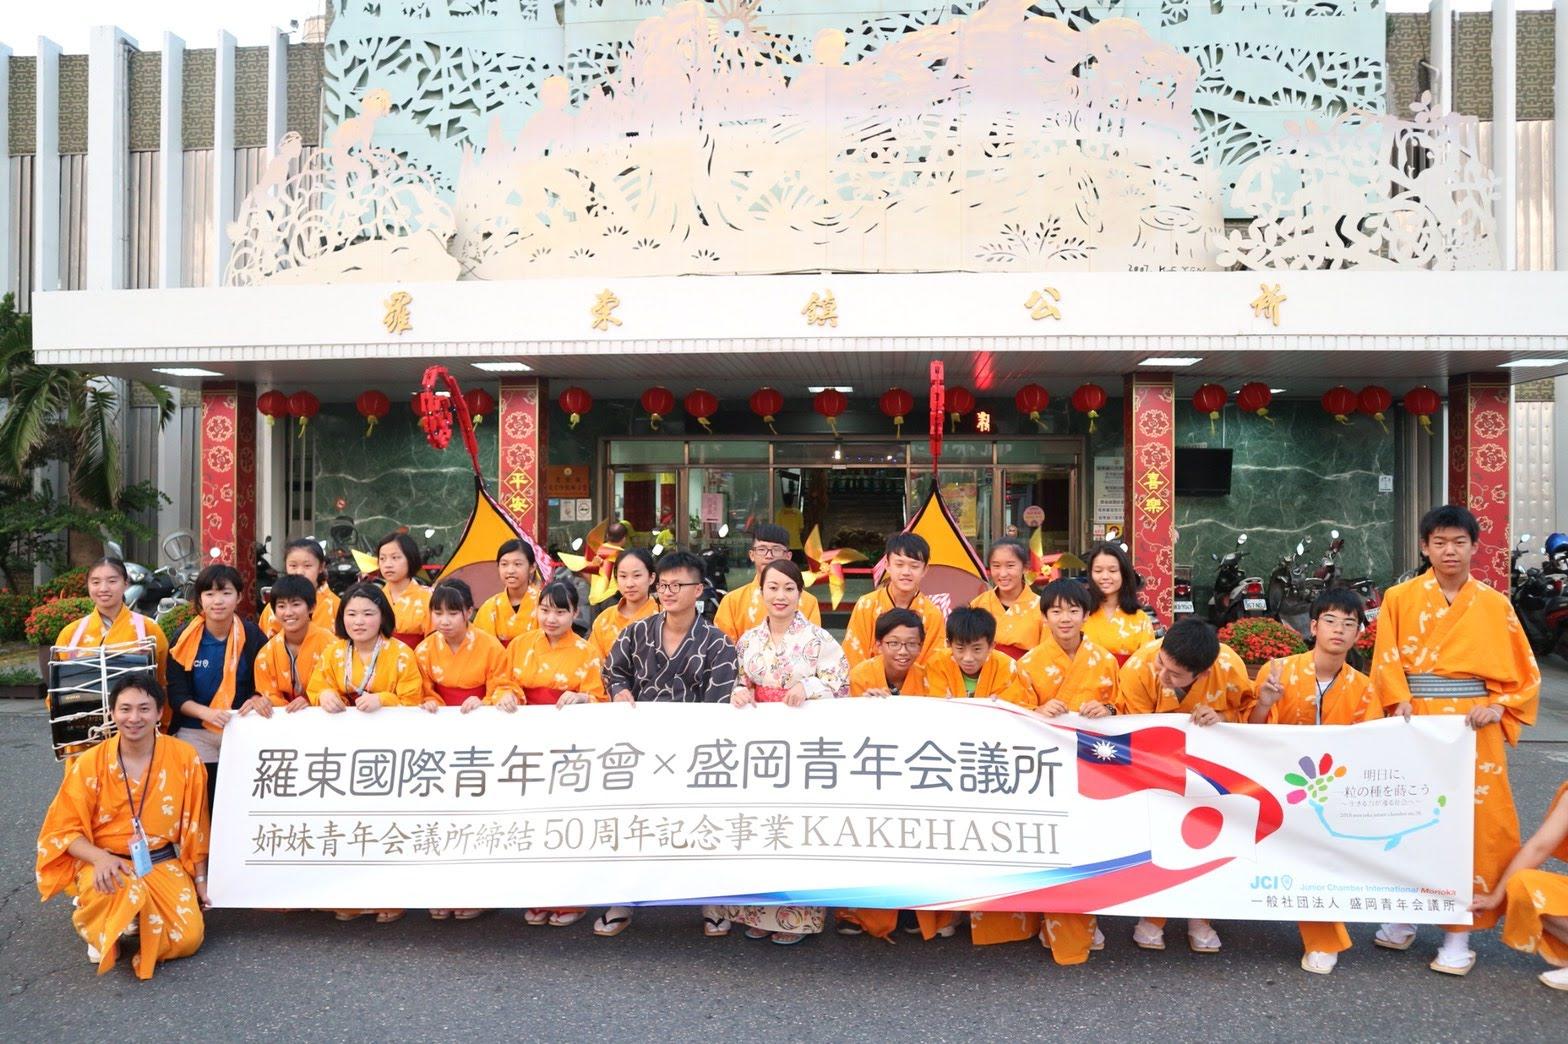 【羅東國際青年商會姉妹締結50周年記念事業「KAKEHASHI」】のご報告